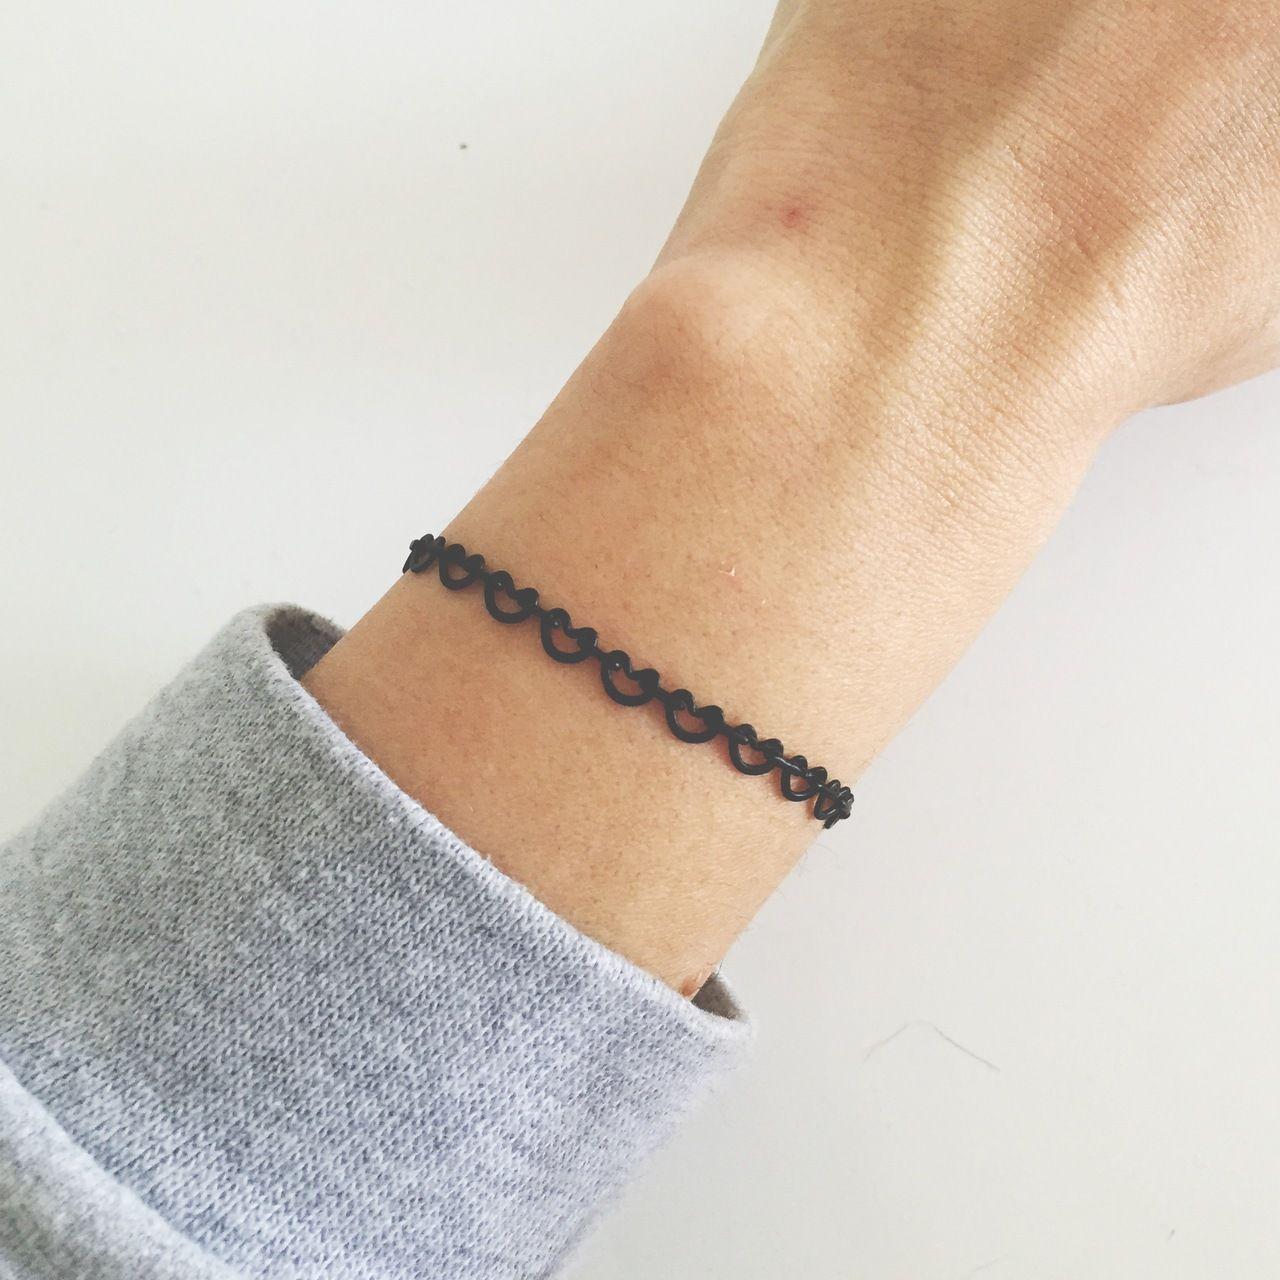 Pin by Behind The Leopard Glasses on jewels & gems   Tattoo bracelet, Bracelets, Tattoos